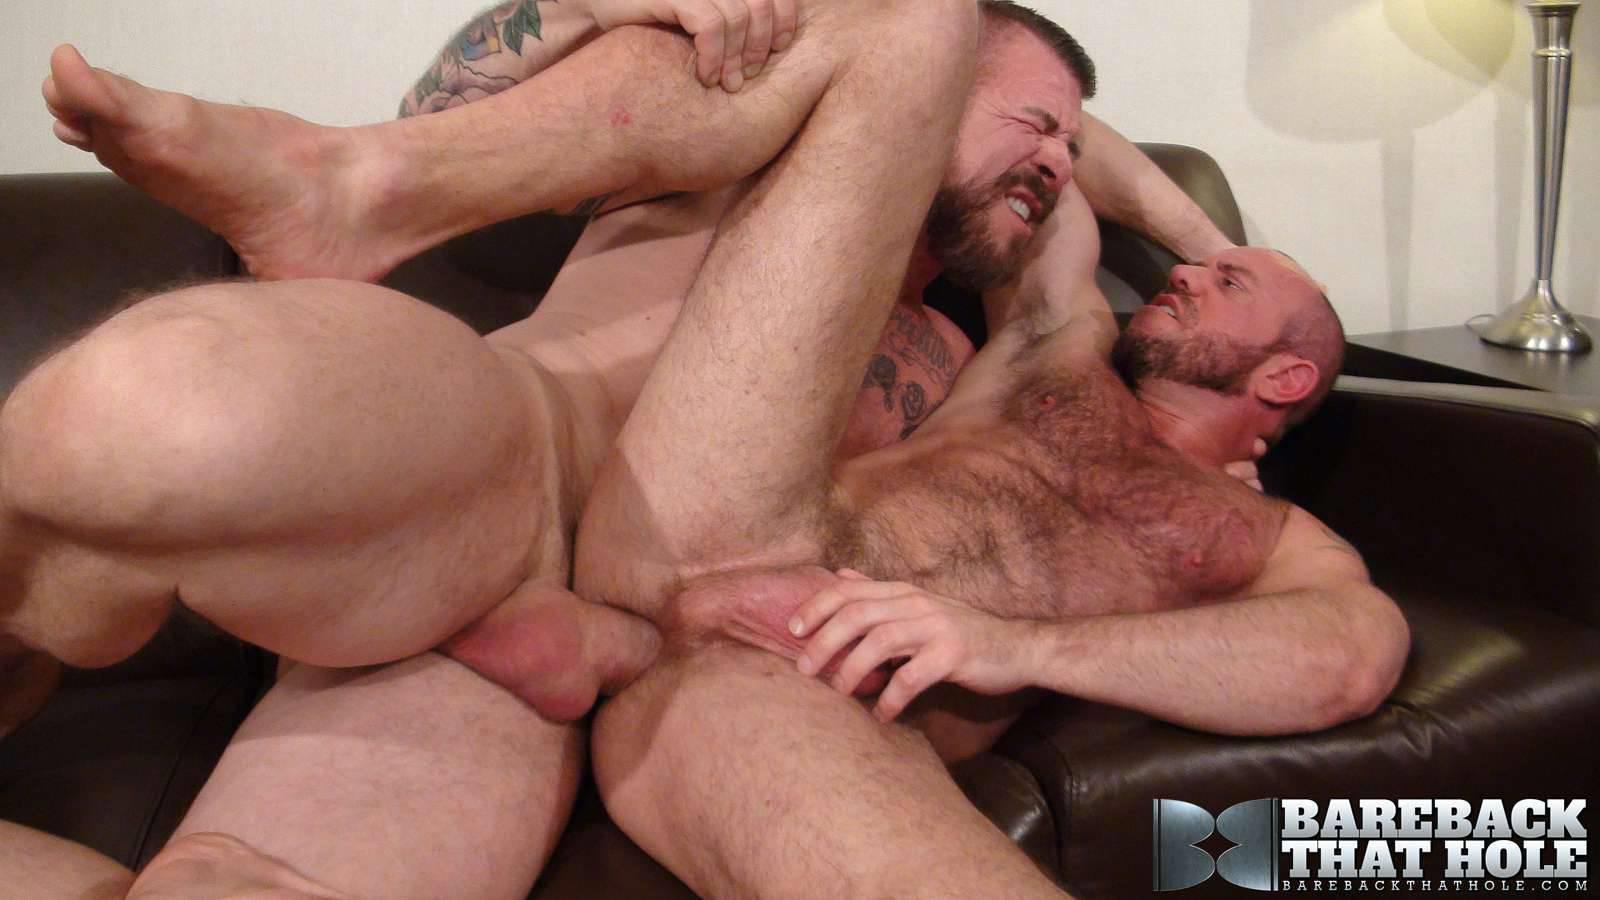 Bareback-That-Hole-Rocco-Steele-and-Matt-Stevens-Hairy-Muscle-Daddy-Bareback-Amateur-Gay-Porn-19 Hairy Muscle Daddy Rocco Steele Breeding Matt Stevens